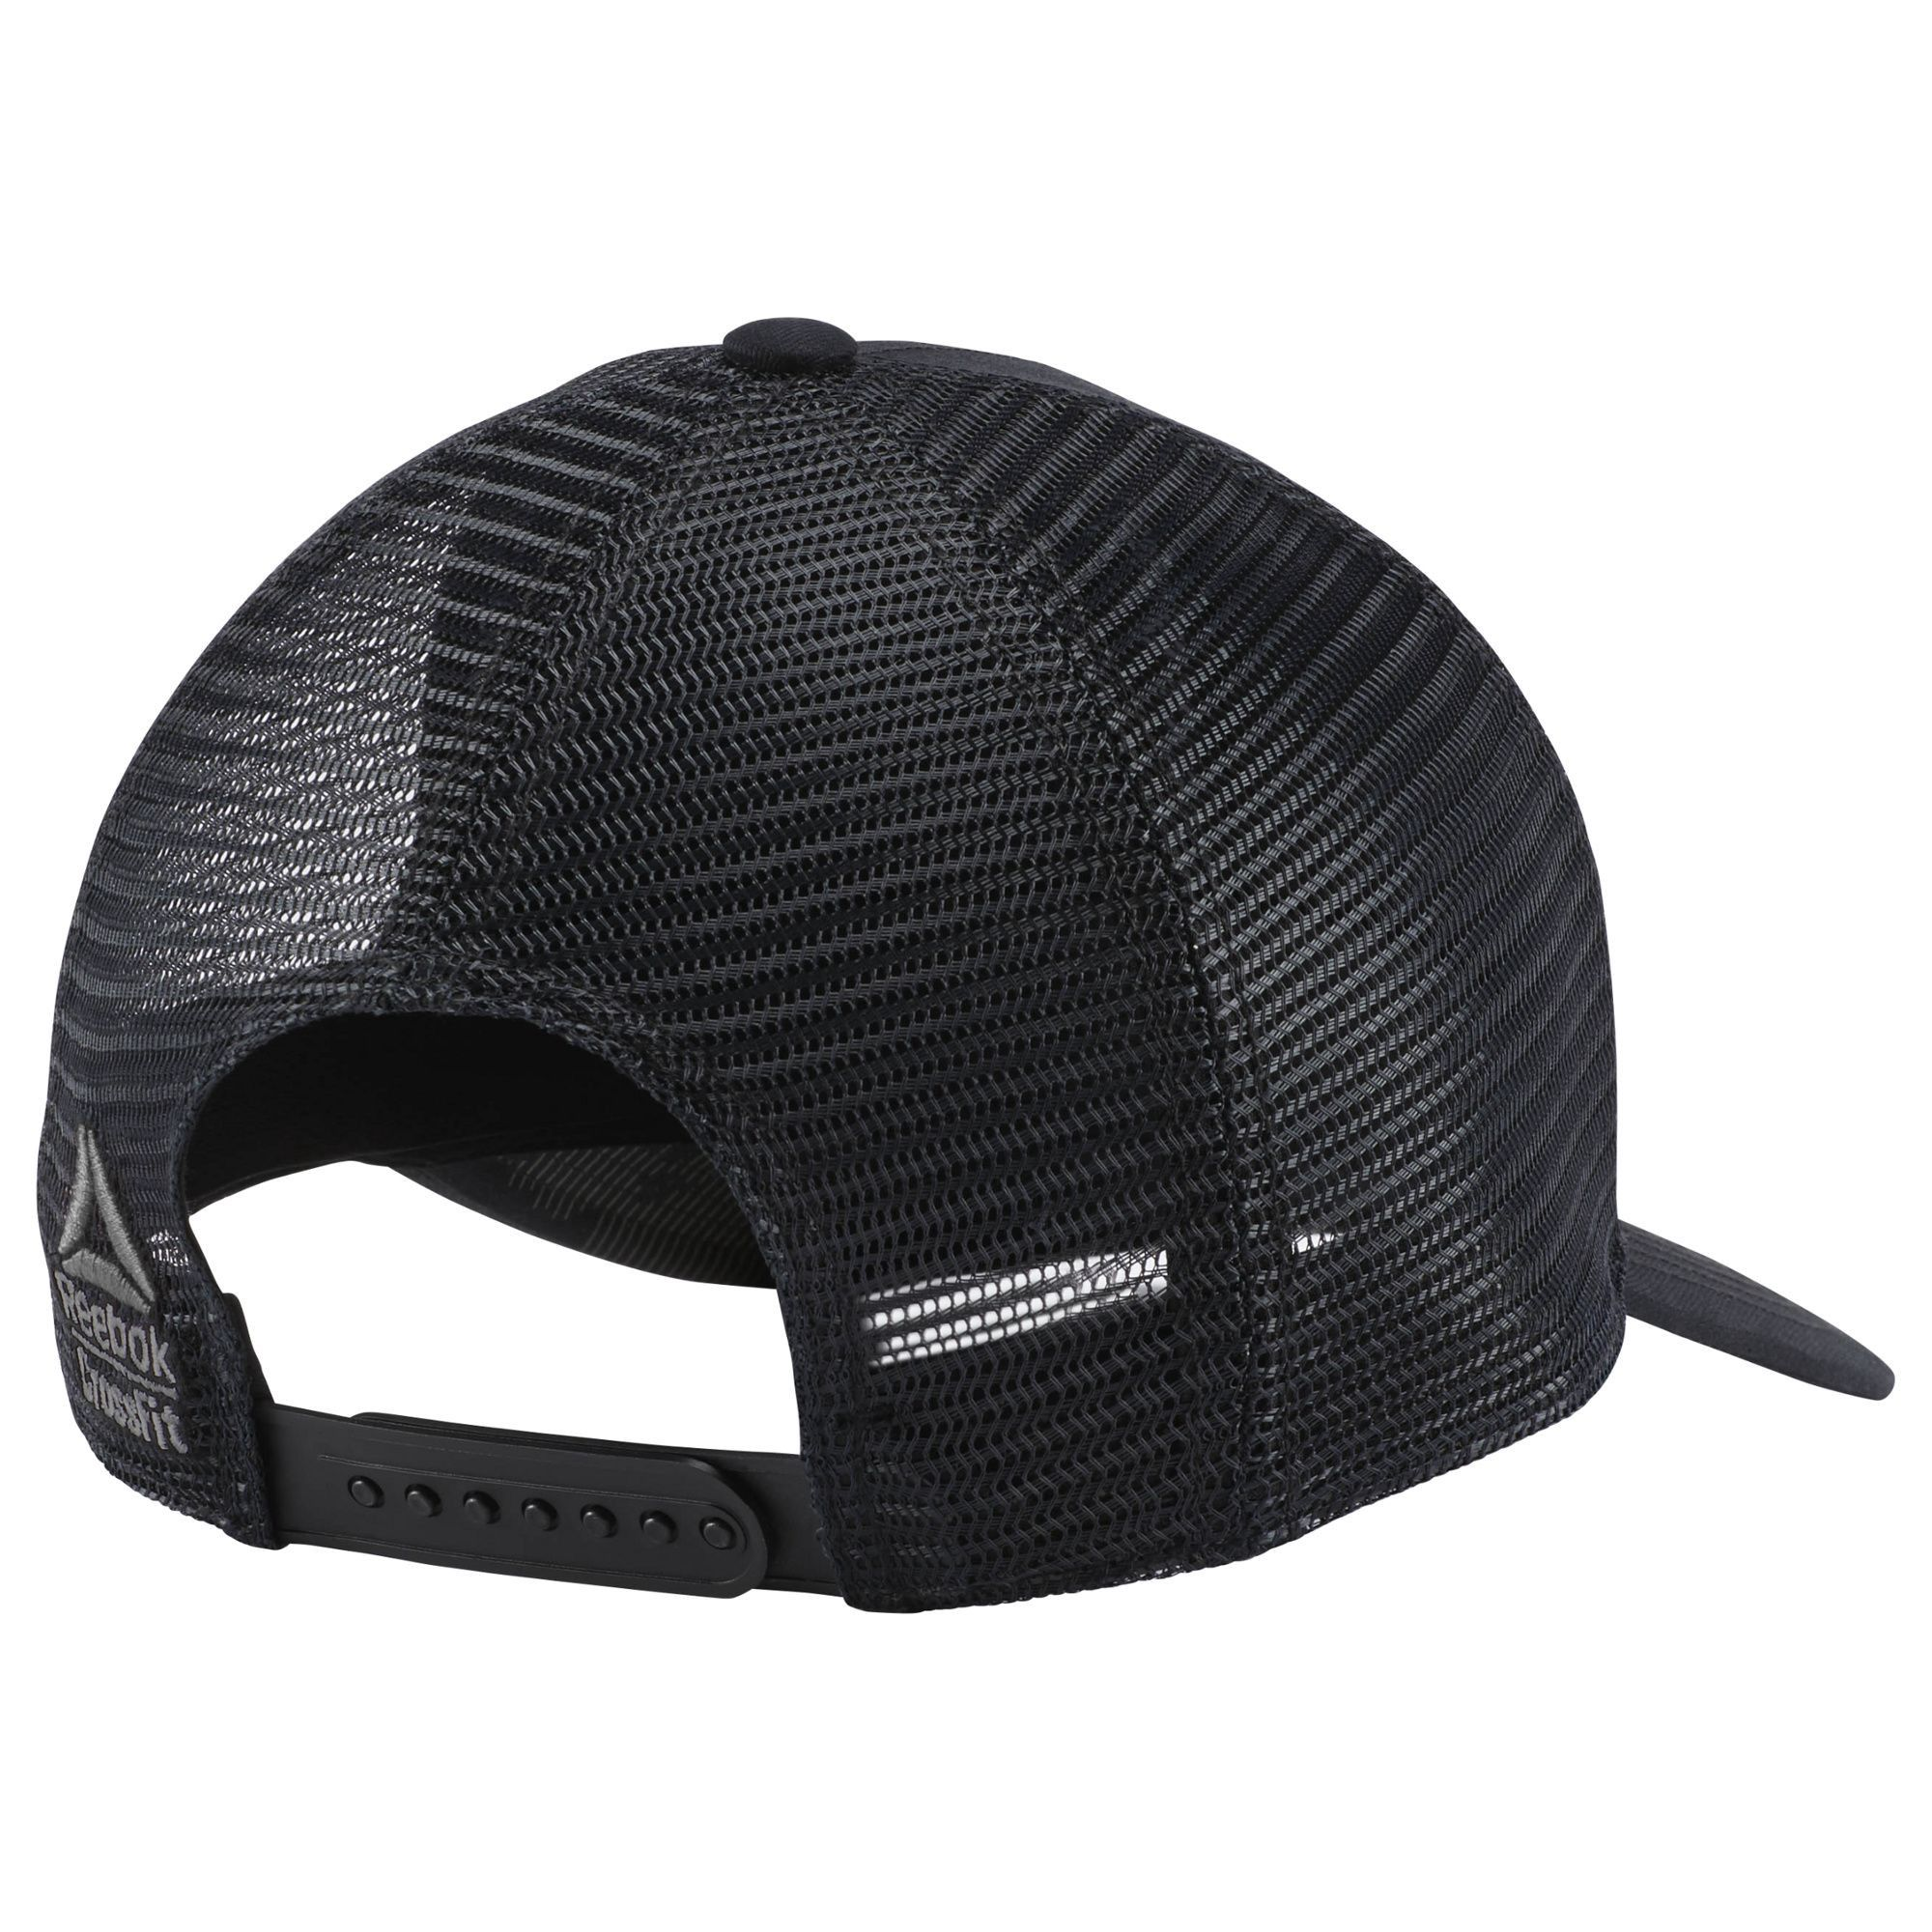 Reebok Crossfit Lifestyle Cap - Black Osfm  800da7828b3b